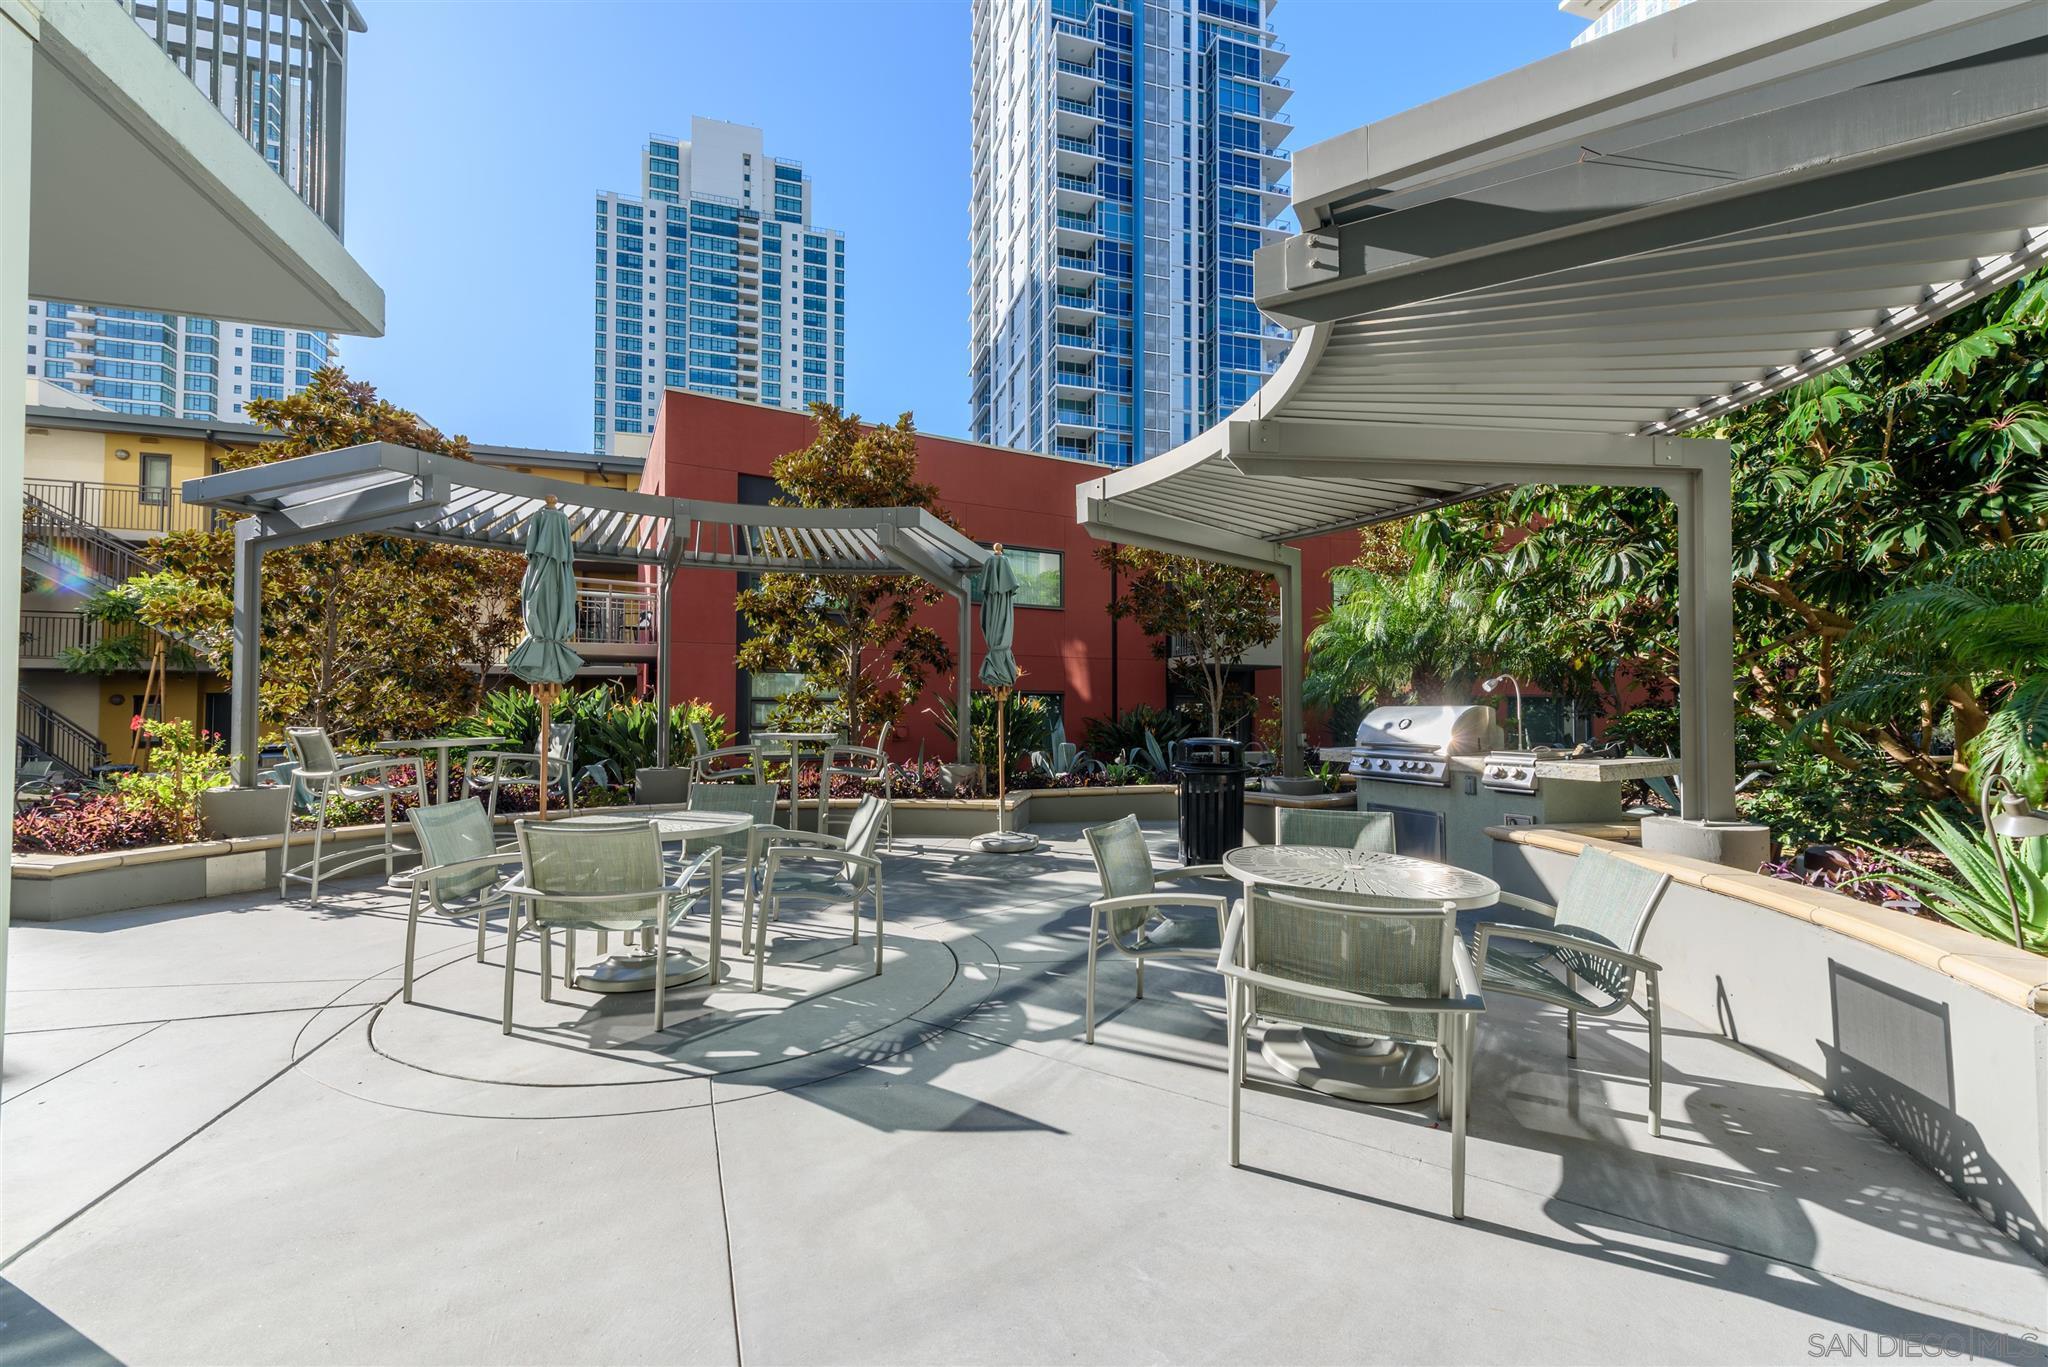 MLS 210016690 San Diego Condo for sale